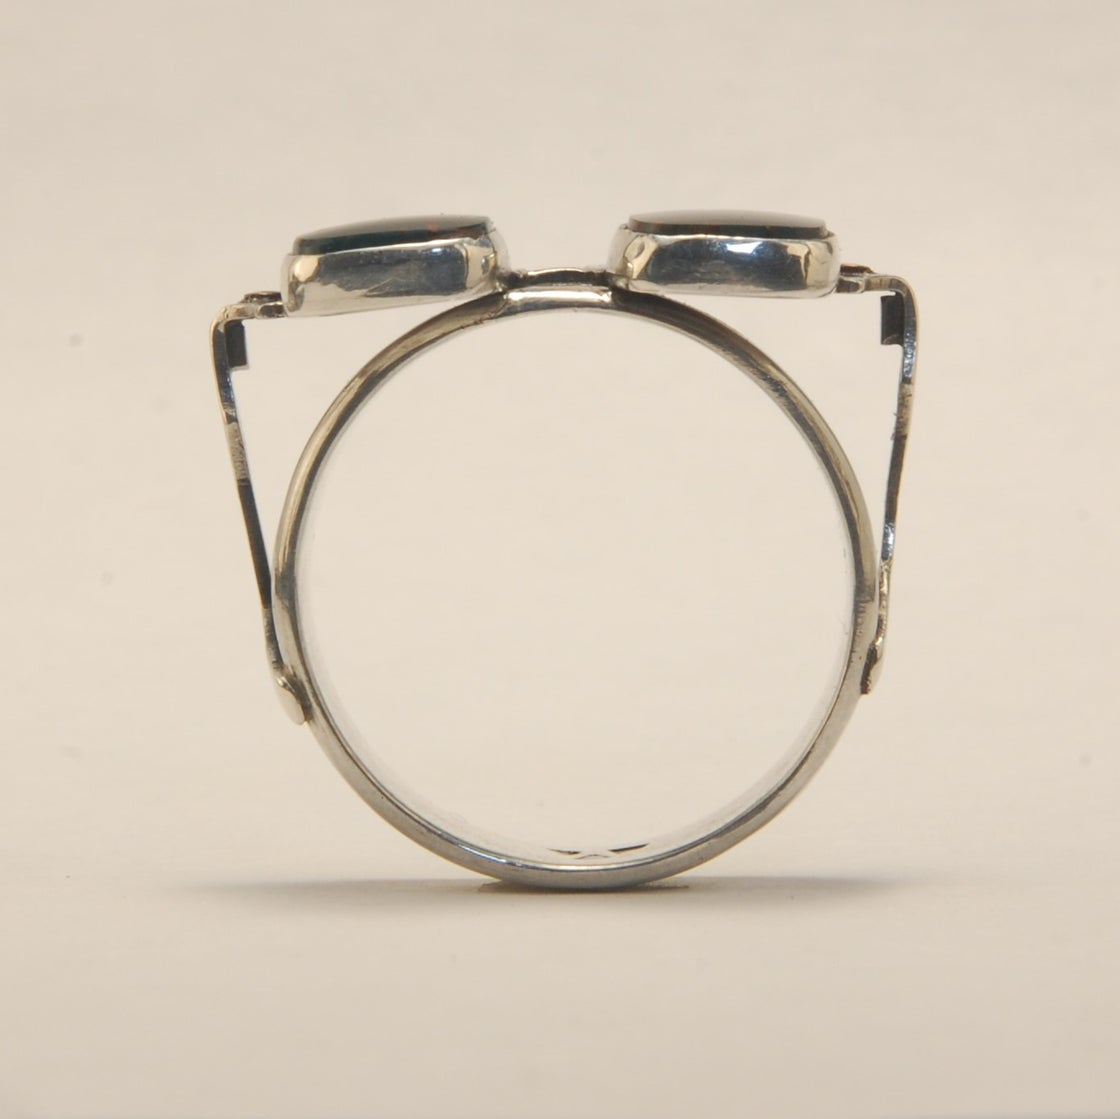 Image of Bloodstone Sunglasses Ring size 10 ¼